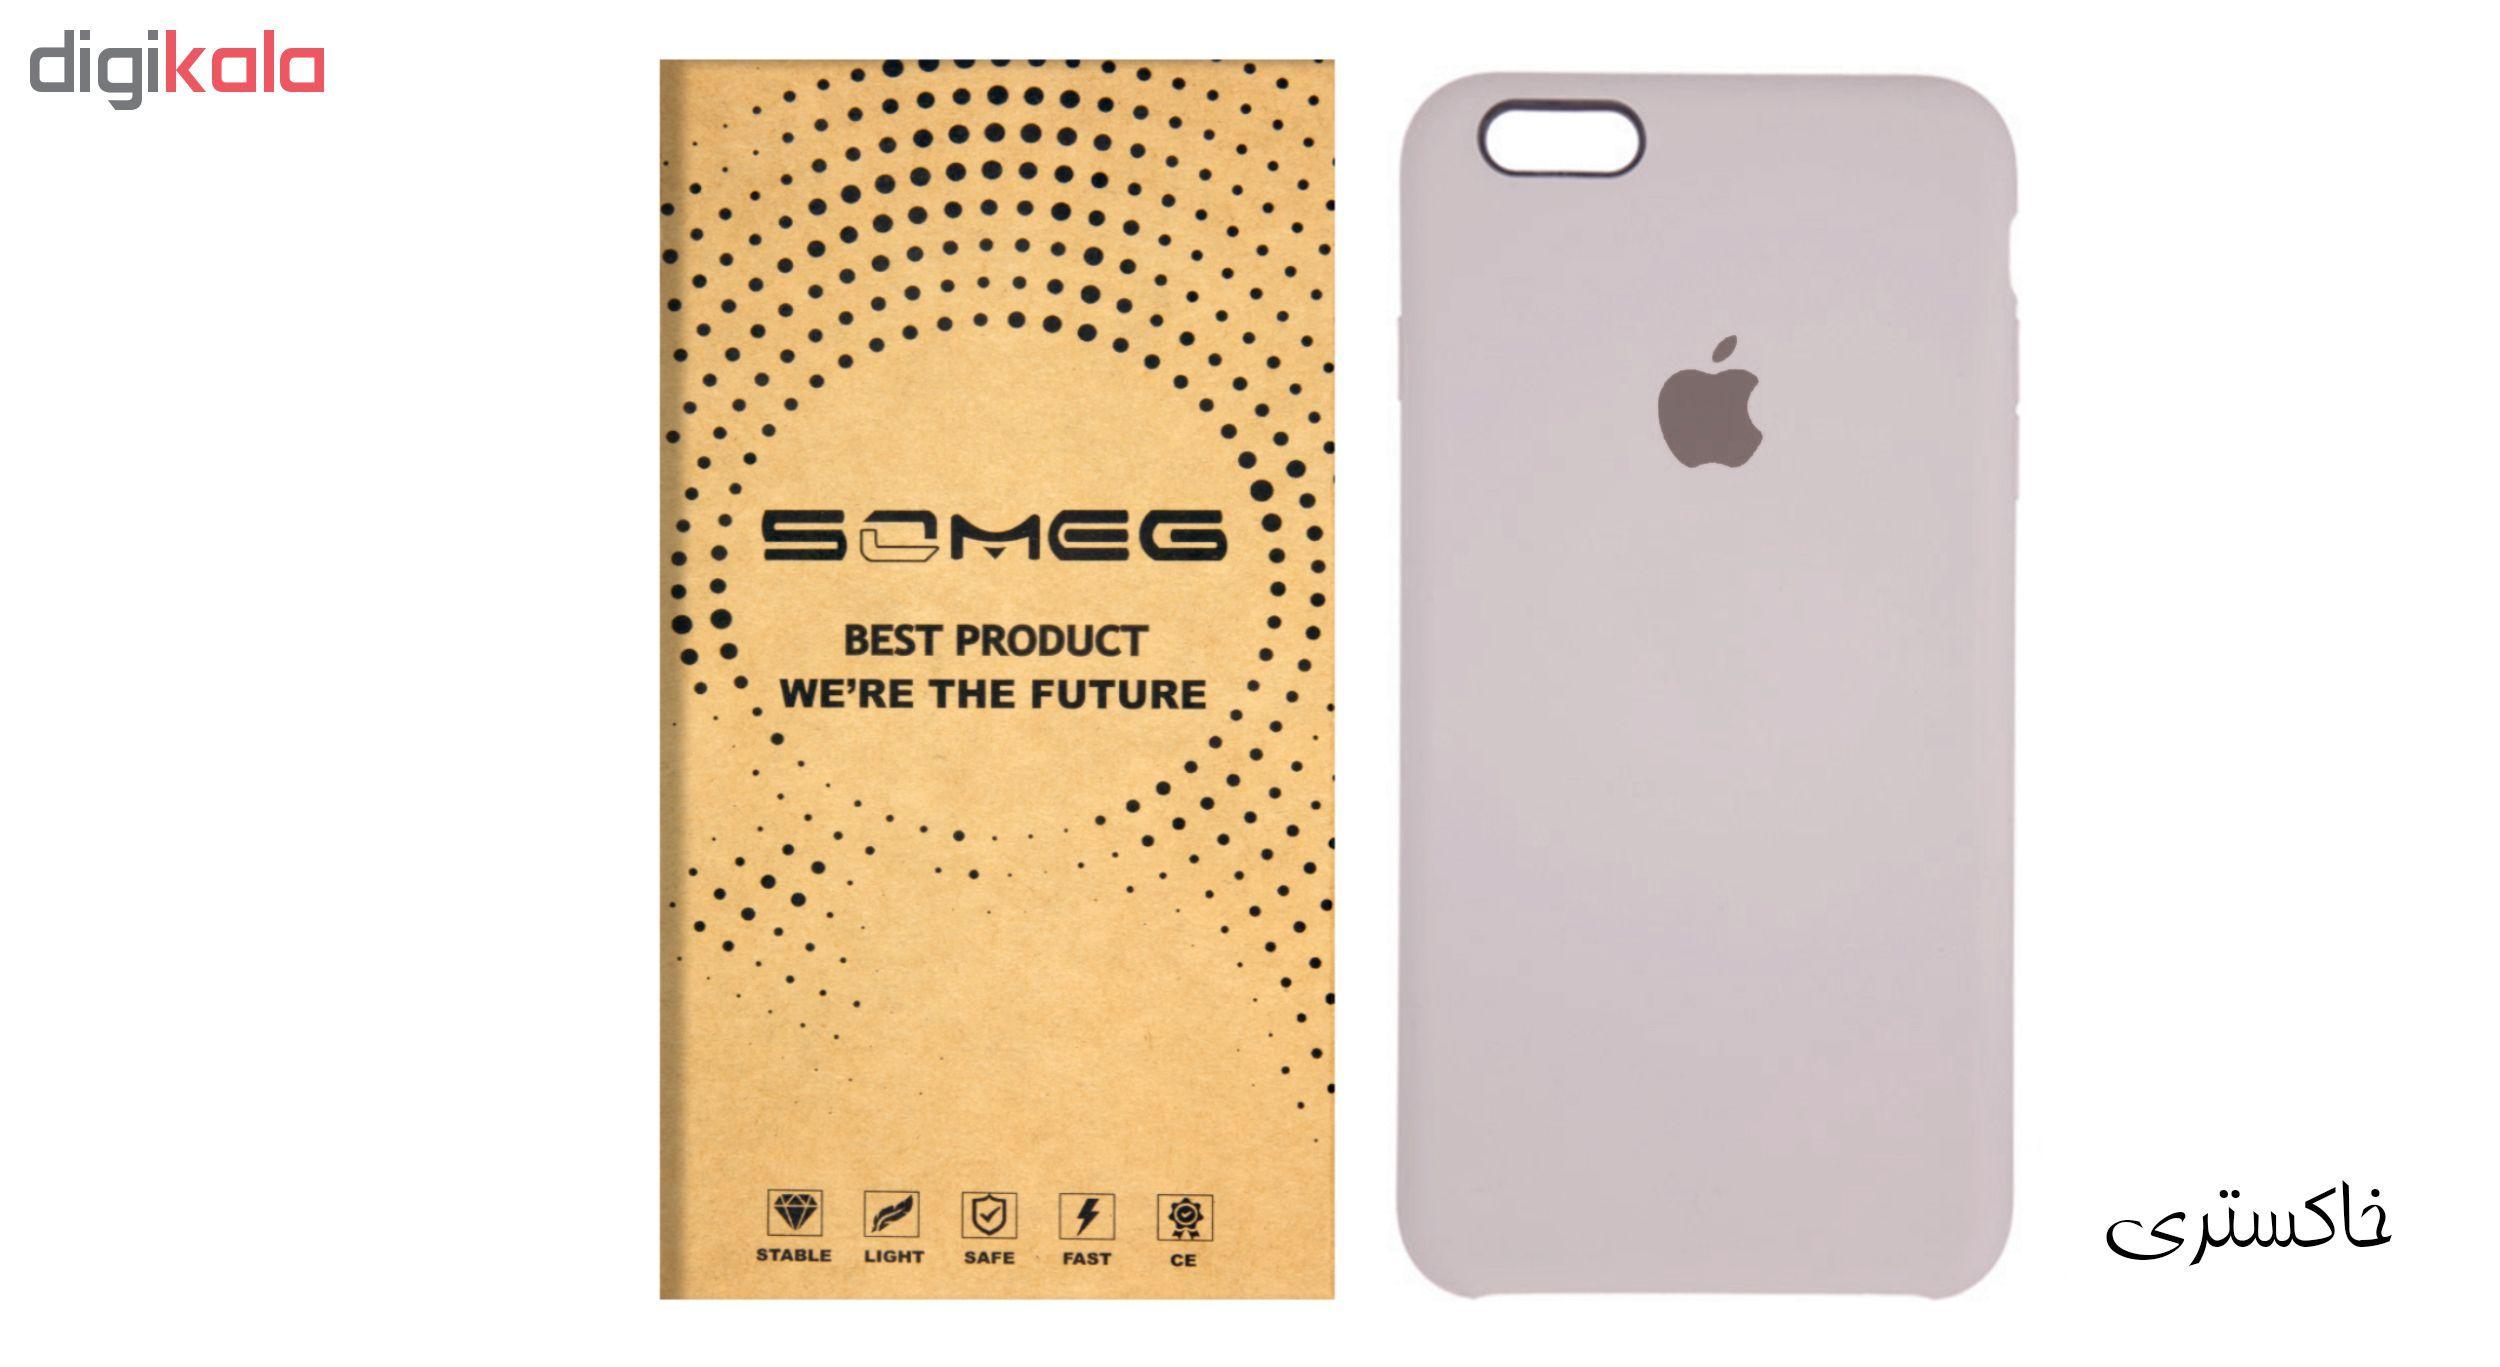 کاور سومگ مدل SIC مناسب برای گوشی موبایل اپل iPhone 6/6s main 1 32